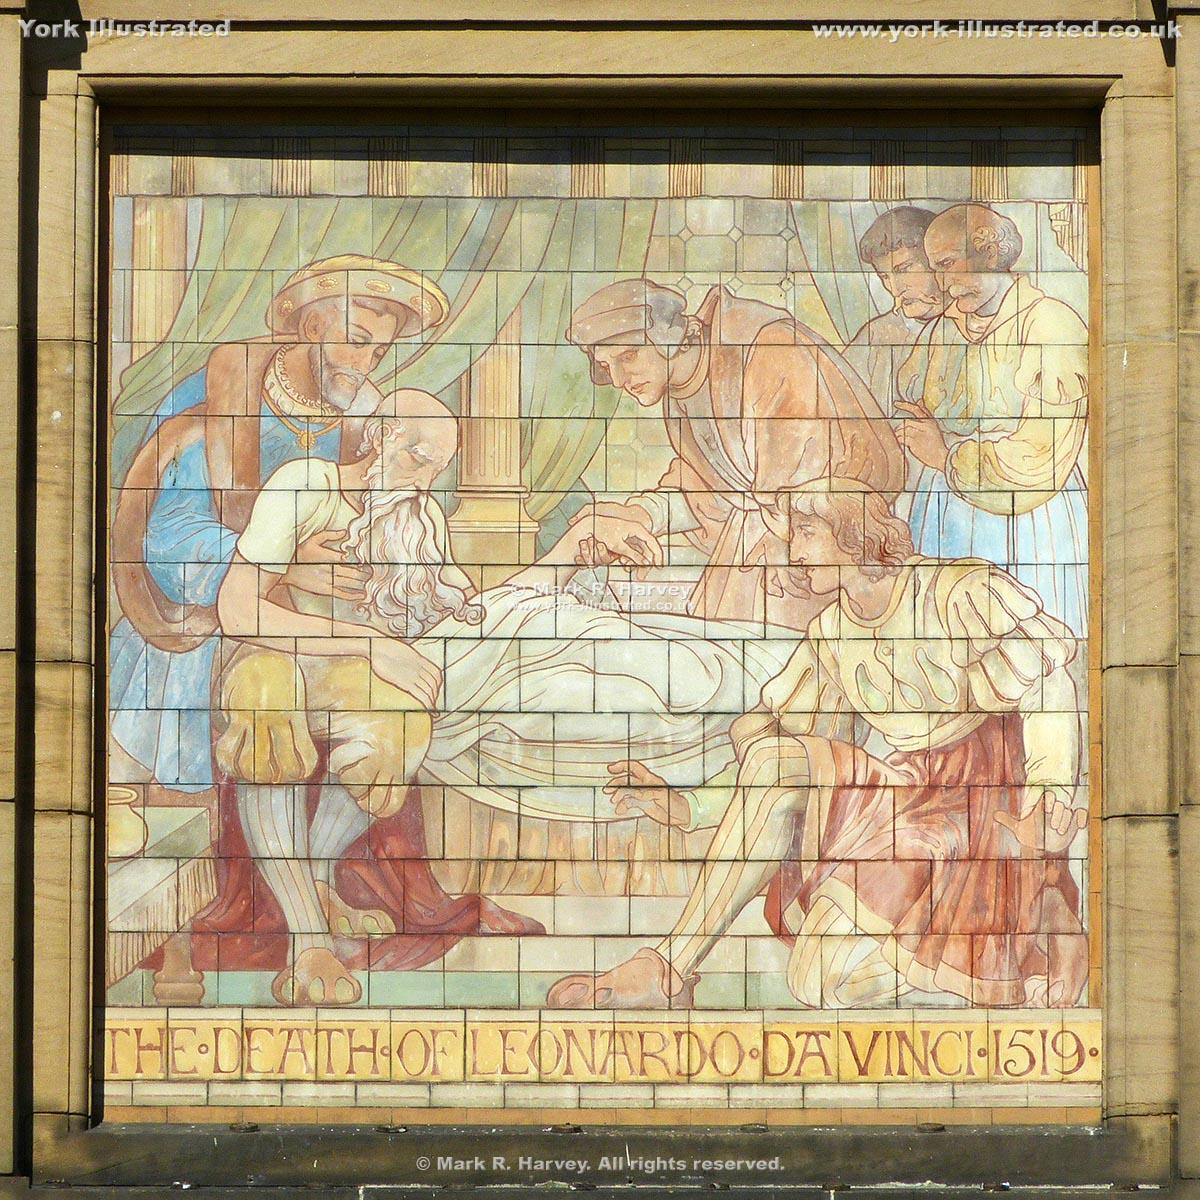 Photograph: Tiled panel depicting death of Leonardo da Vinci on York Art Gallery facade.